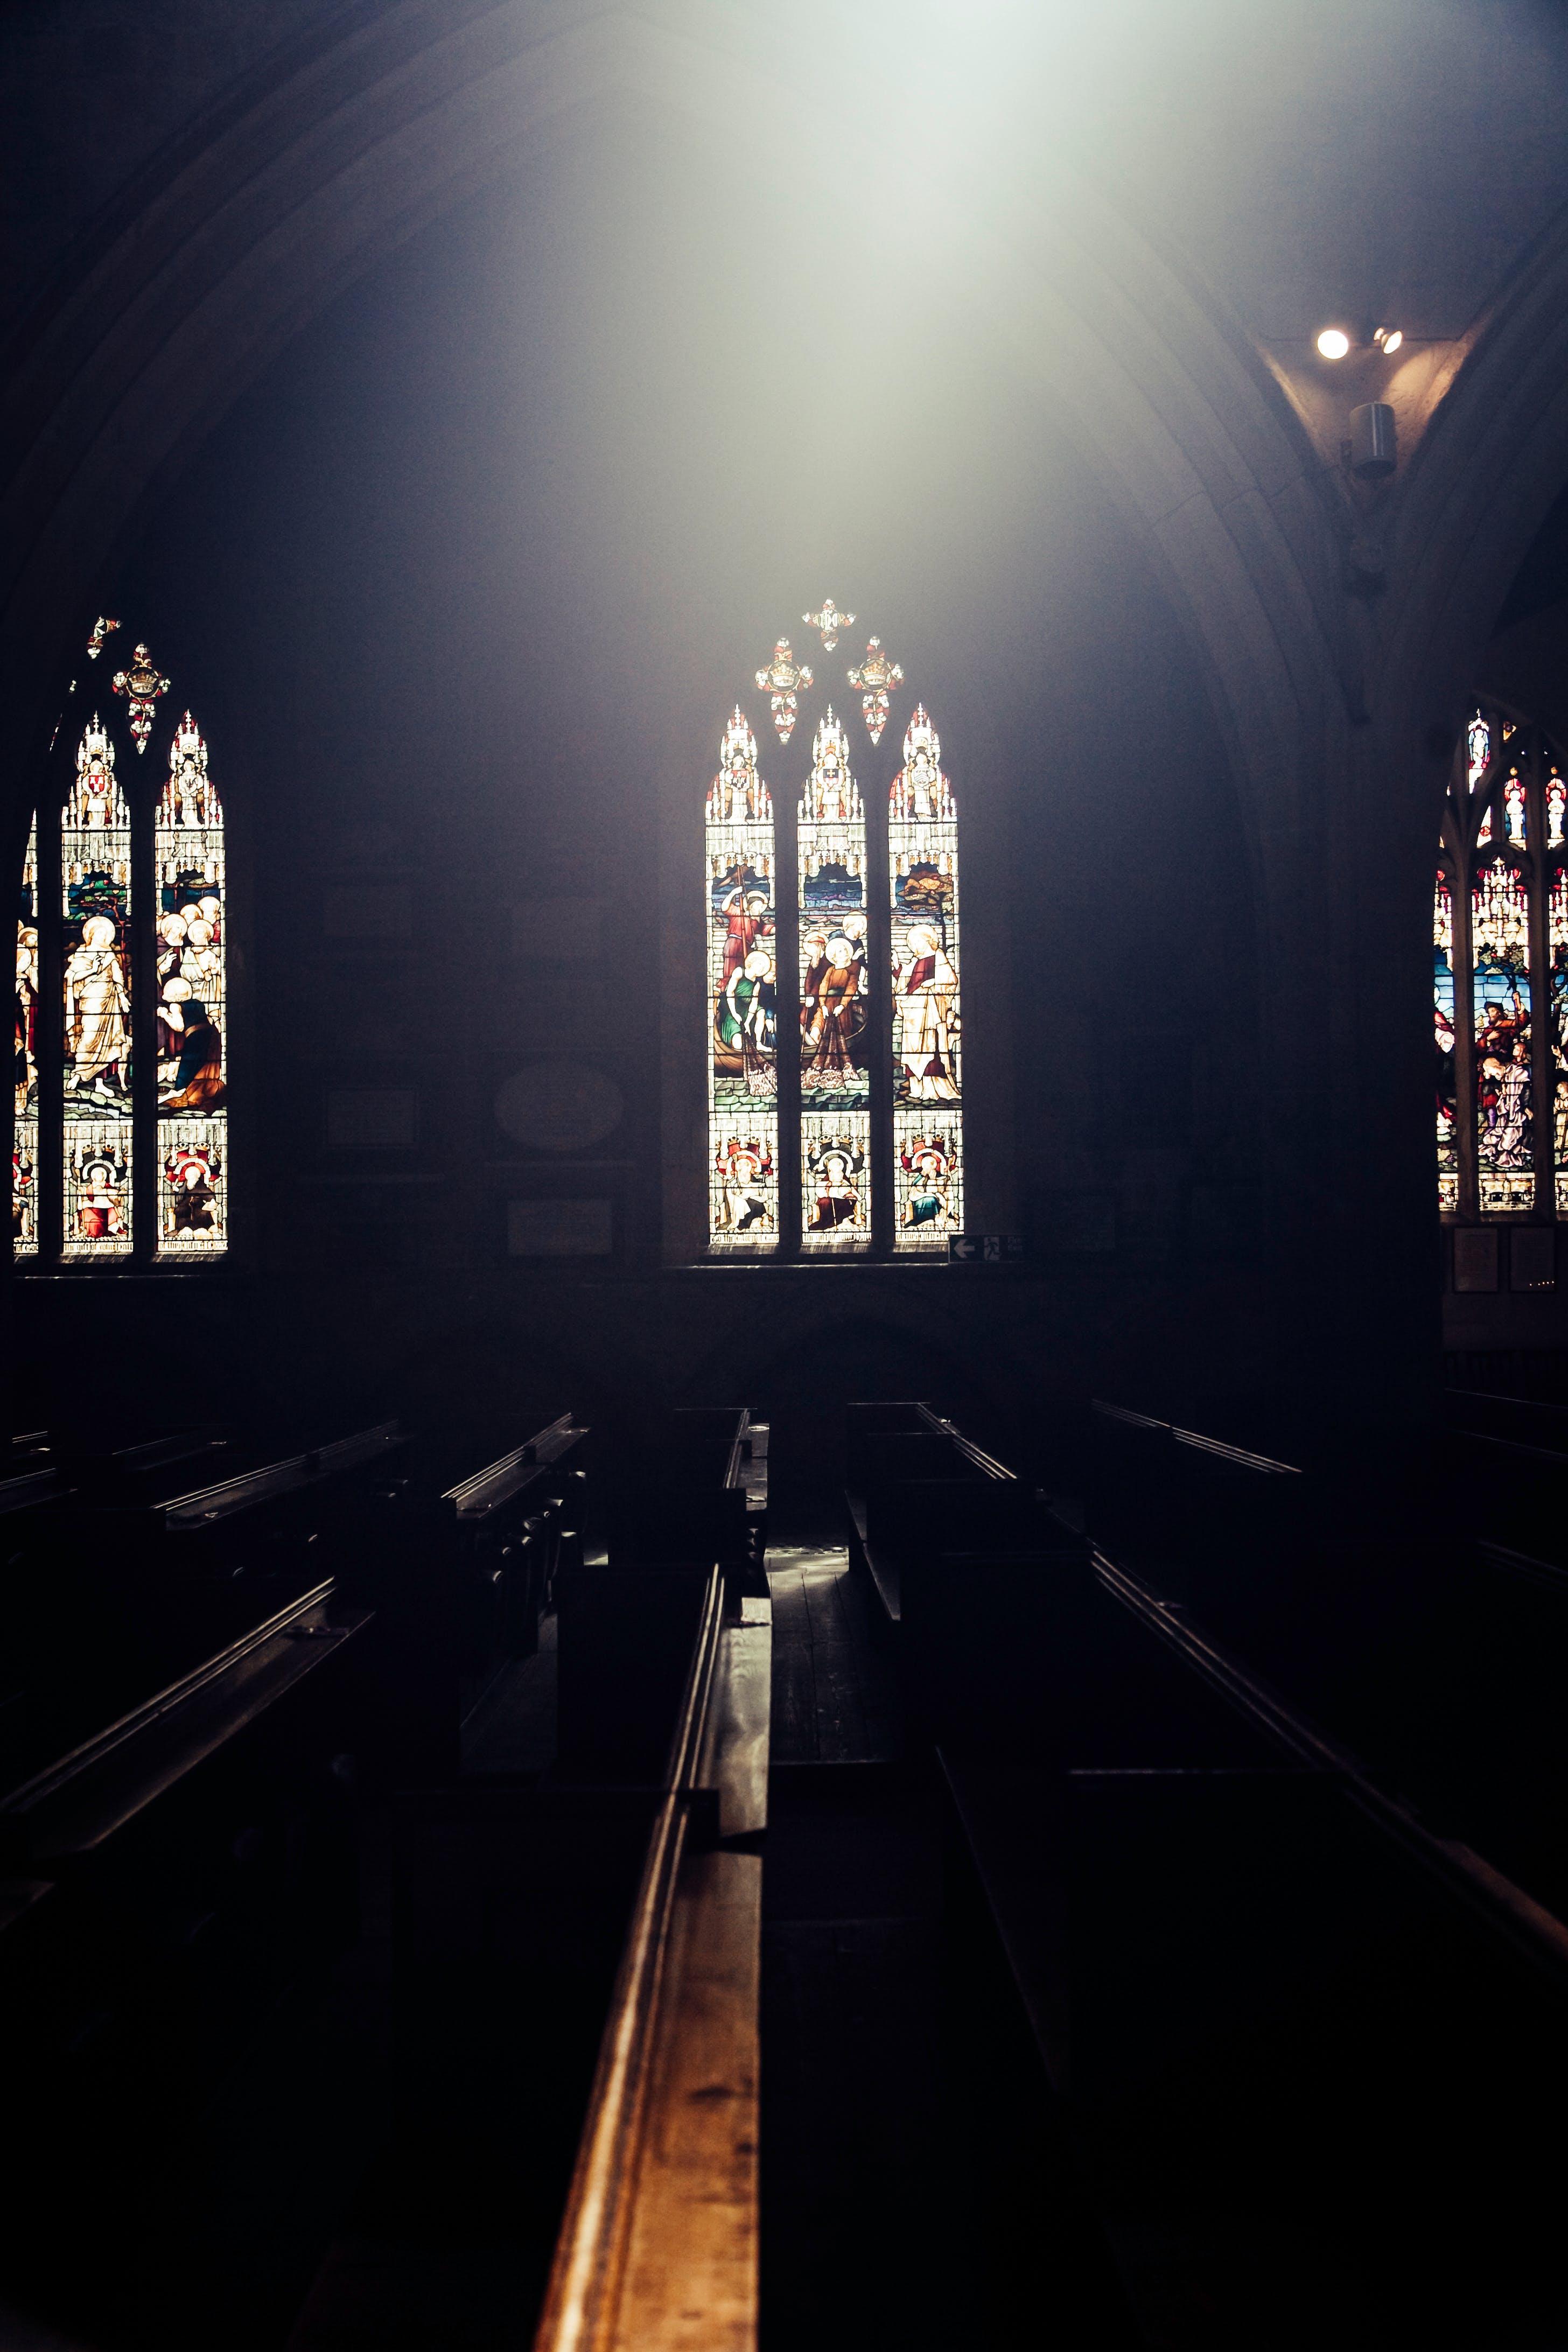 Free stock photo of church, glass panes, windows